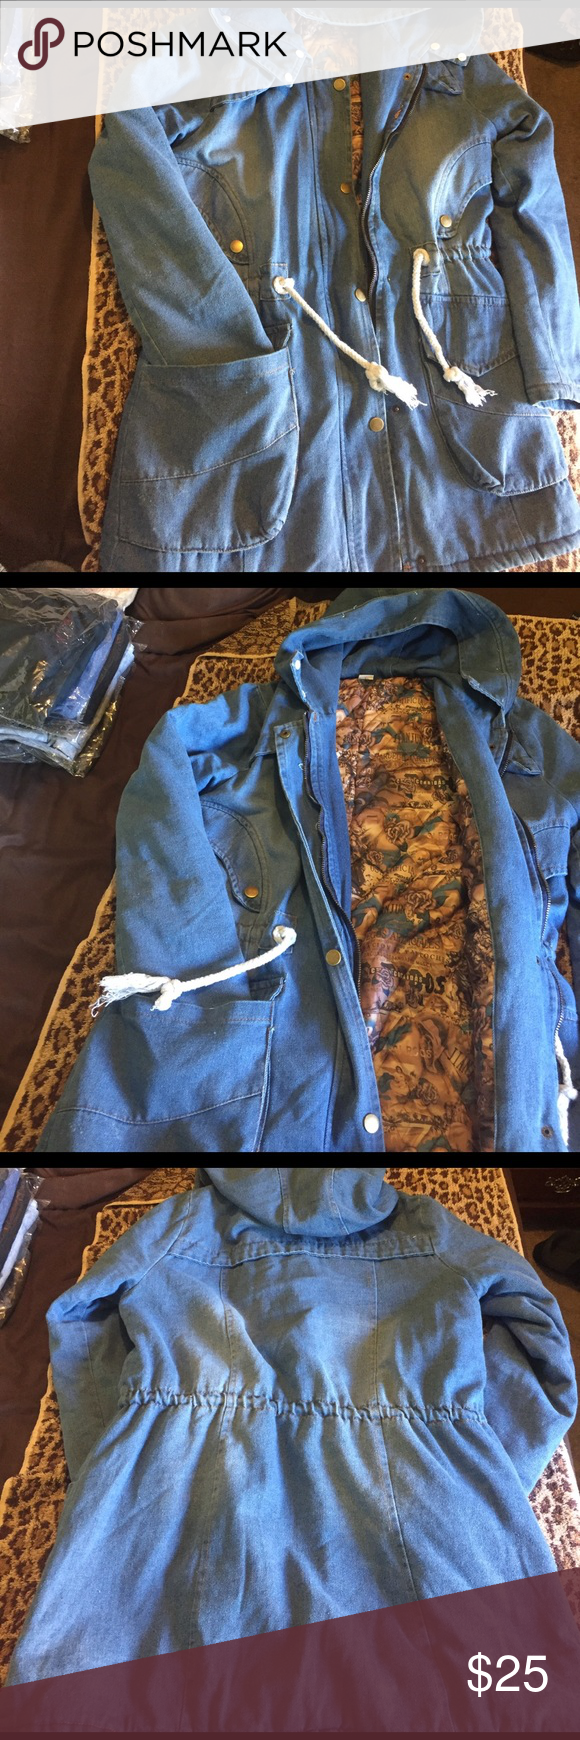 jacket beatiful jacket Jackets & Coats Jean Jackets